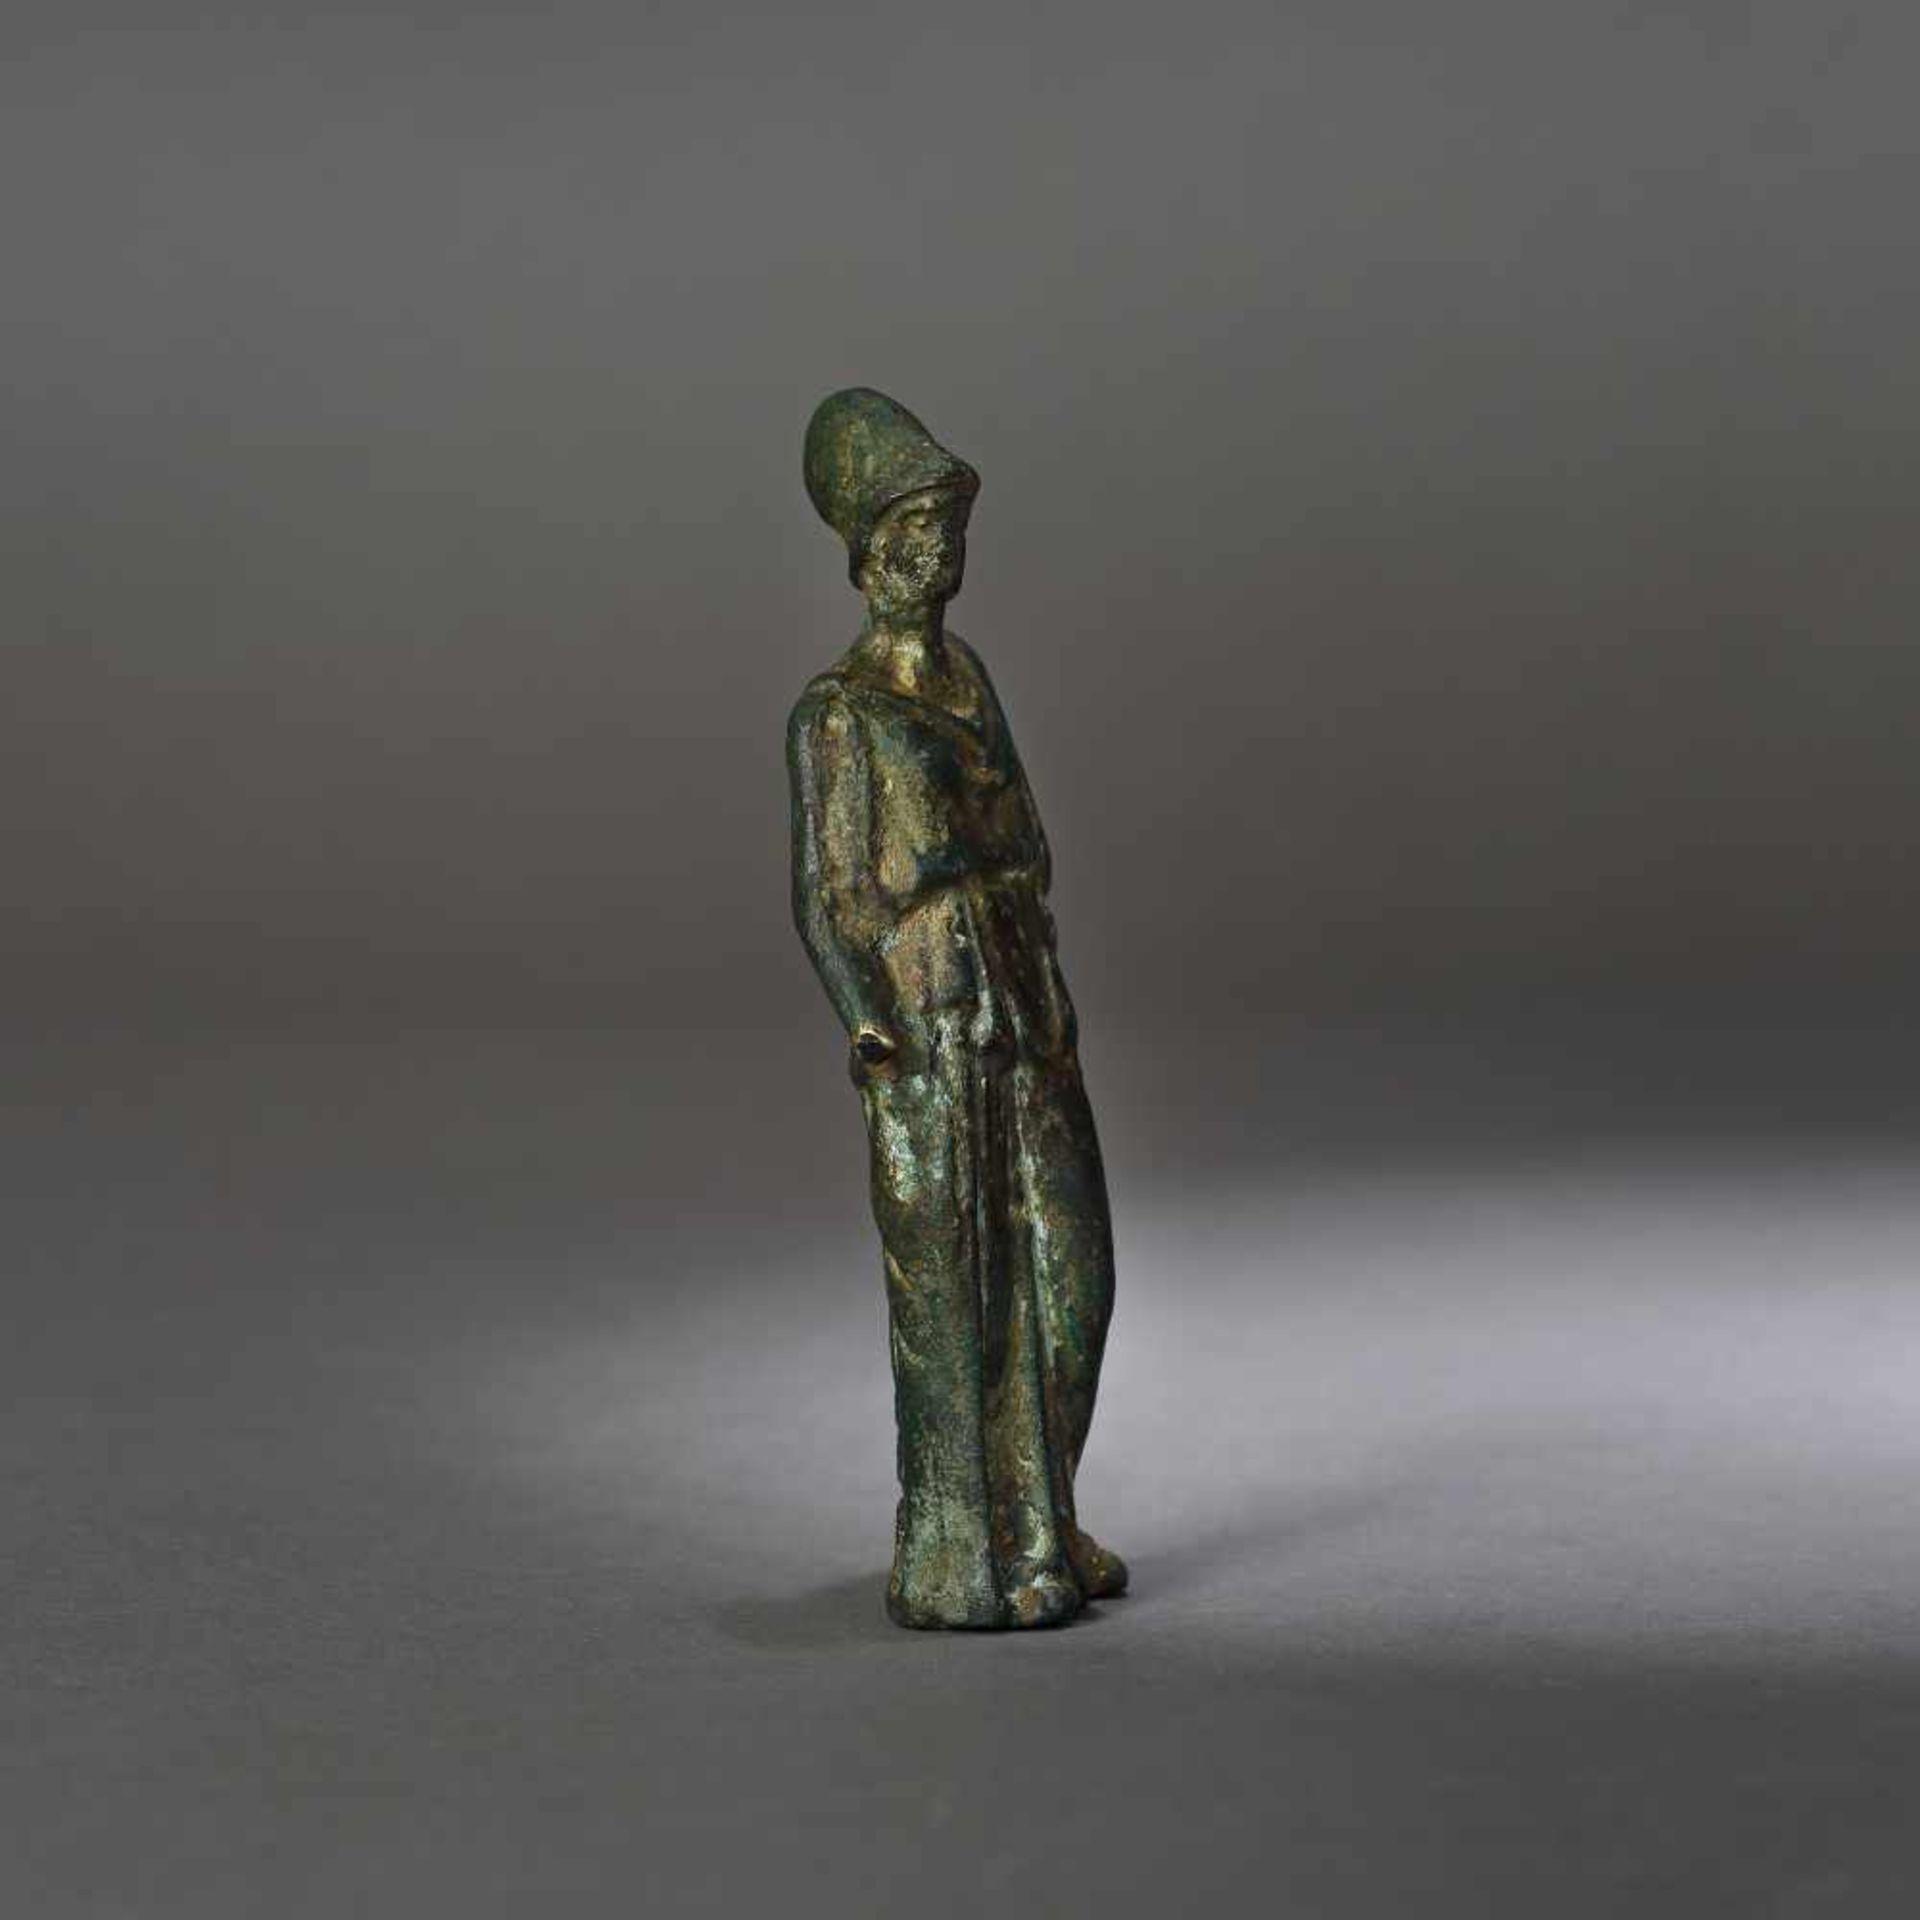 Bronze statuette depicting Athena, the goddess of wisdom, 1st century B.C. - Bild 3 aus 4